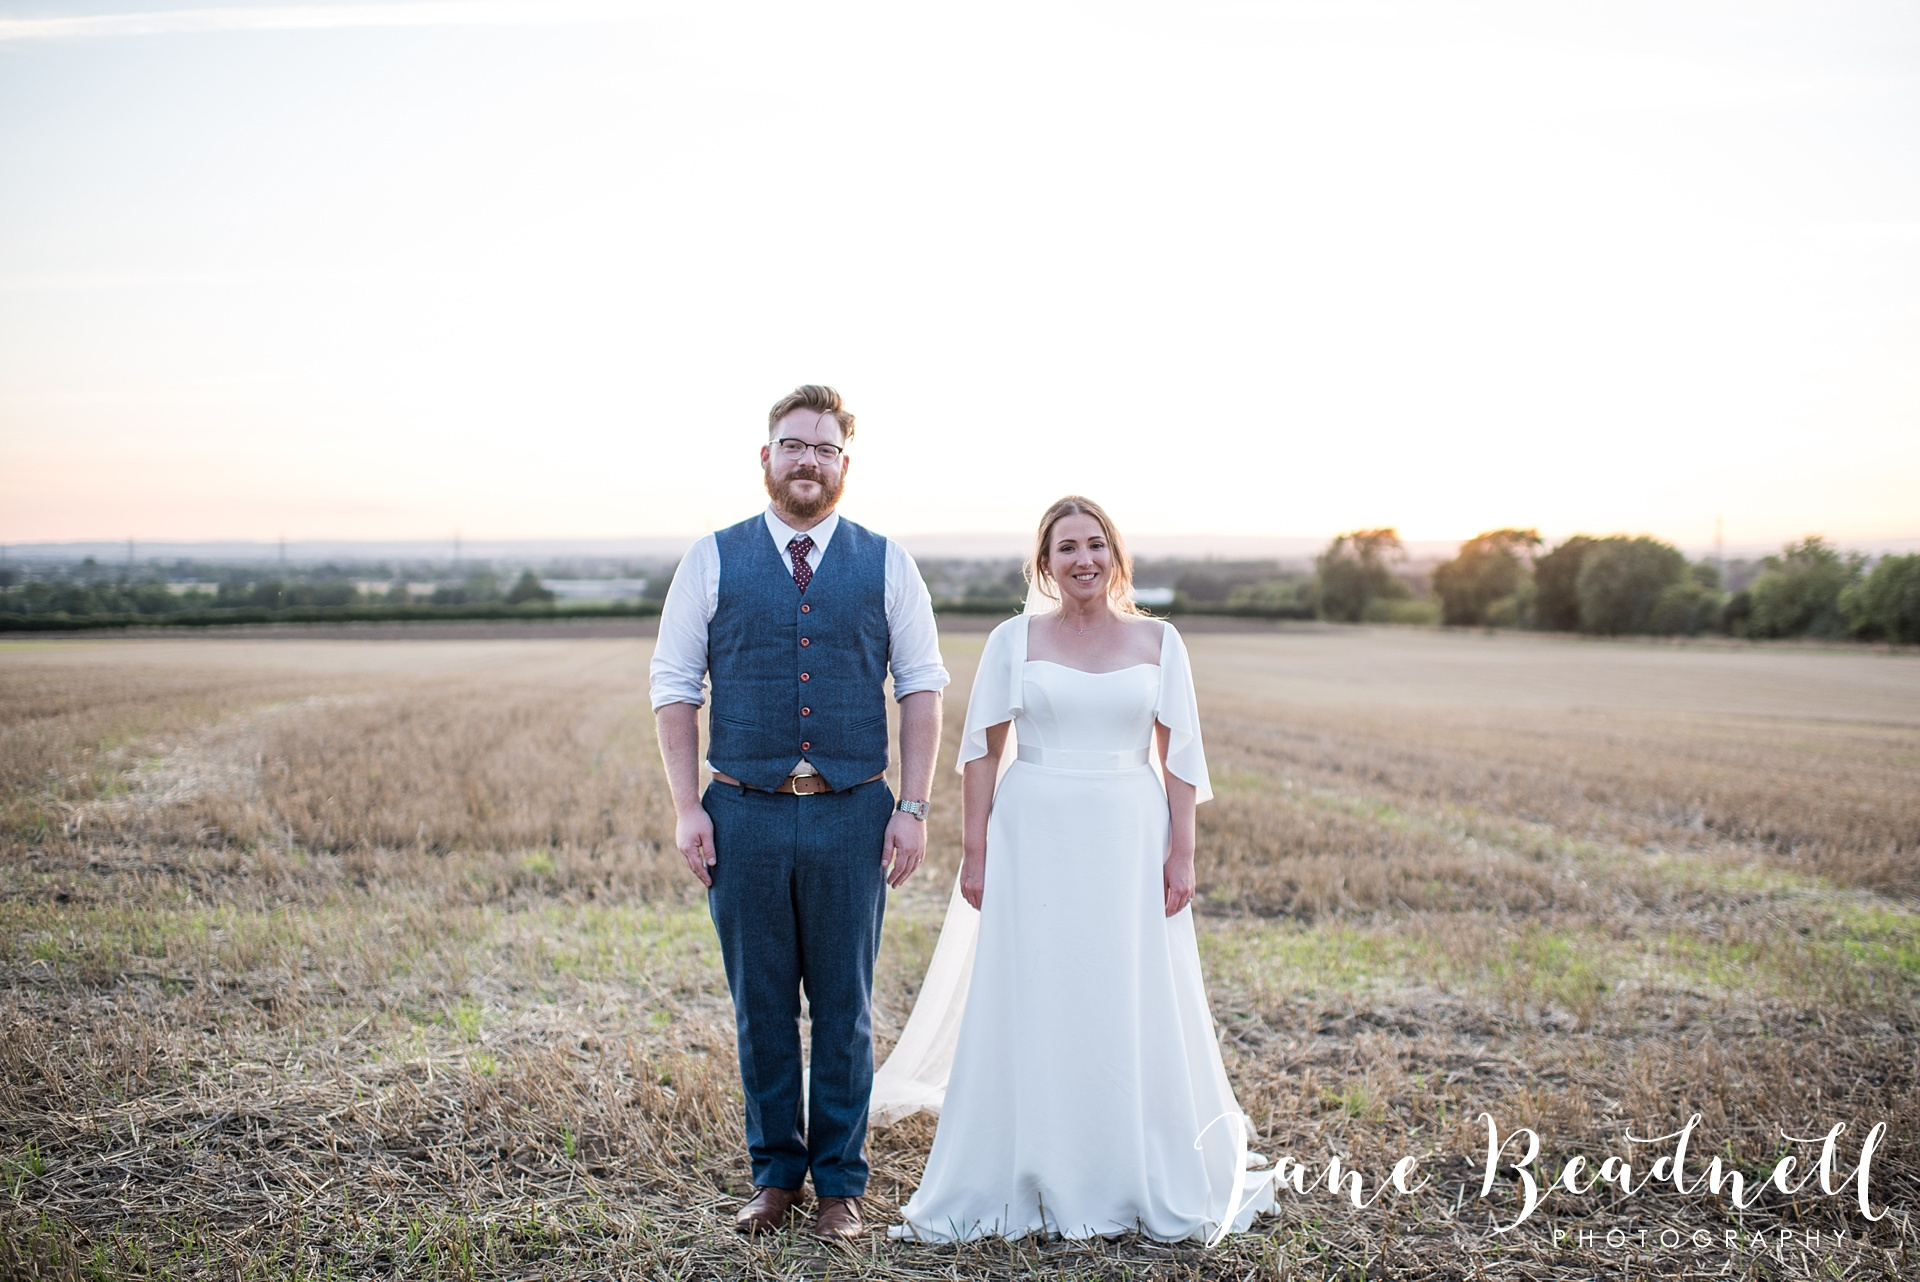 fine-art-wedding-photographer-jane-beadnell-yorkshire-wedding-photographer_0154